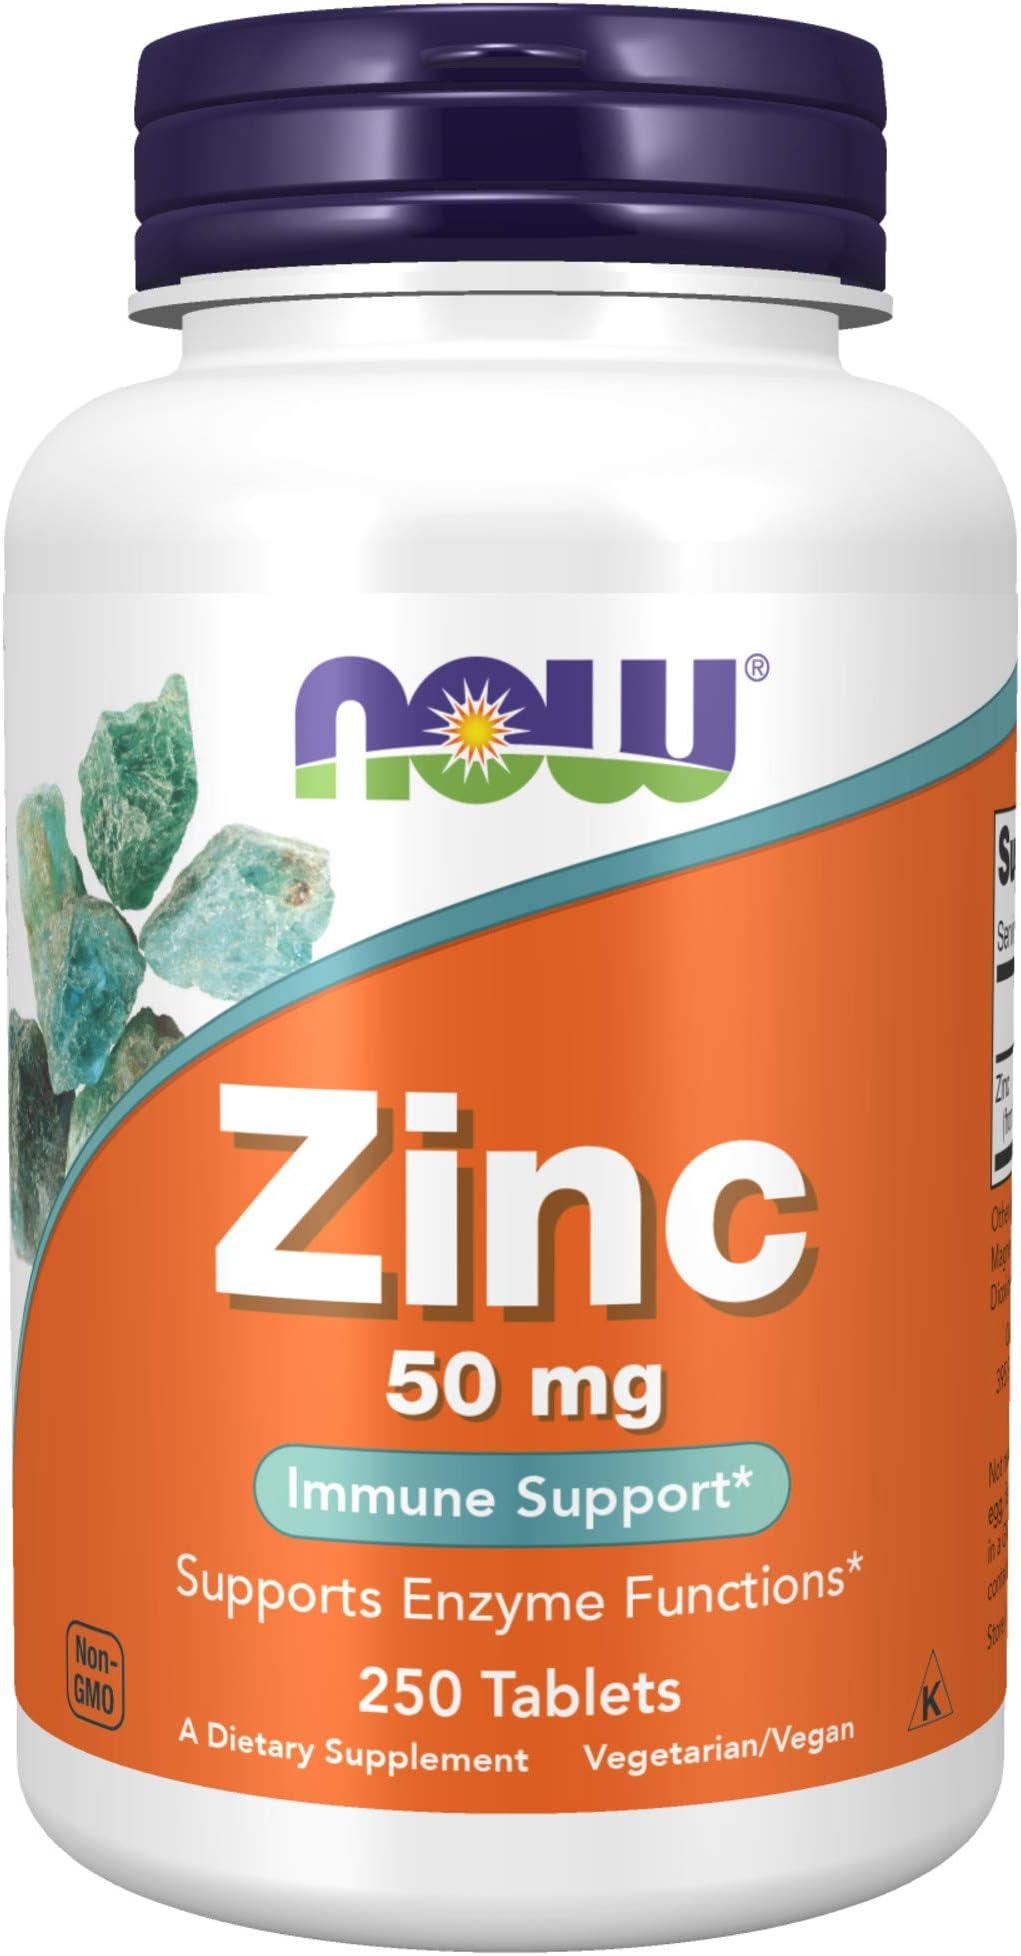 Now Foods Zinc 50 Mg 250 Tablets price in Saudi Arabia Amazon Saudi Arabia kanbkam